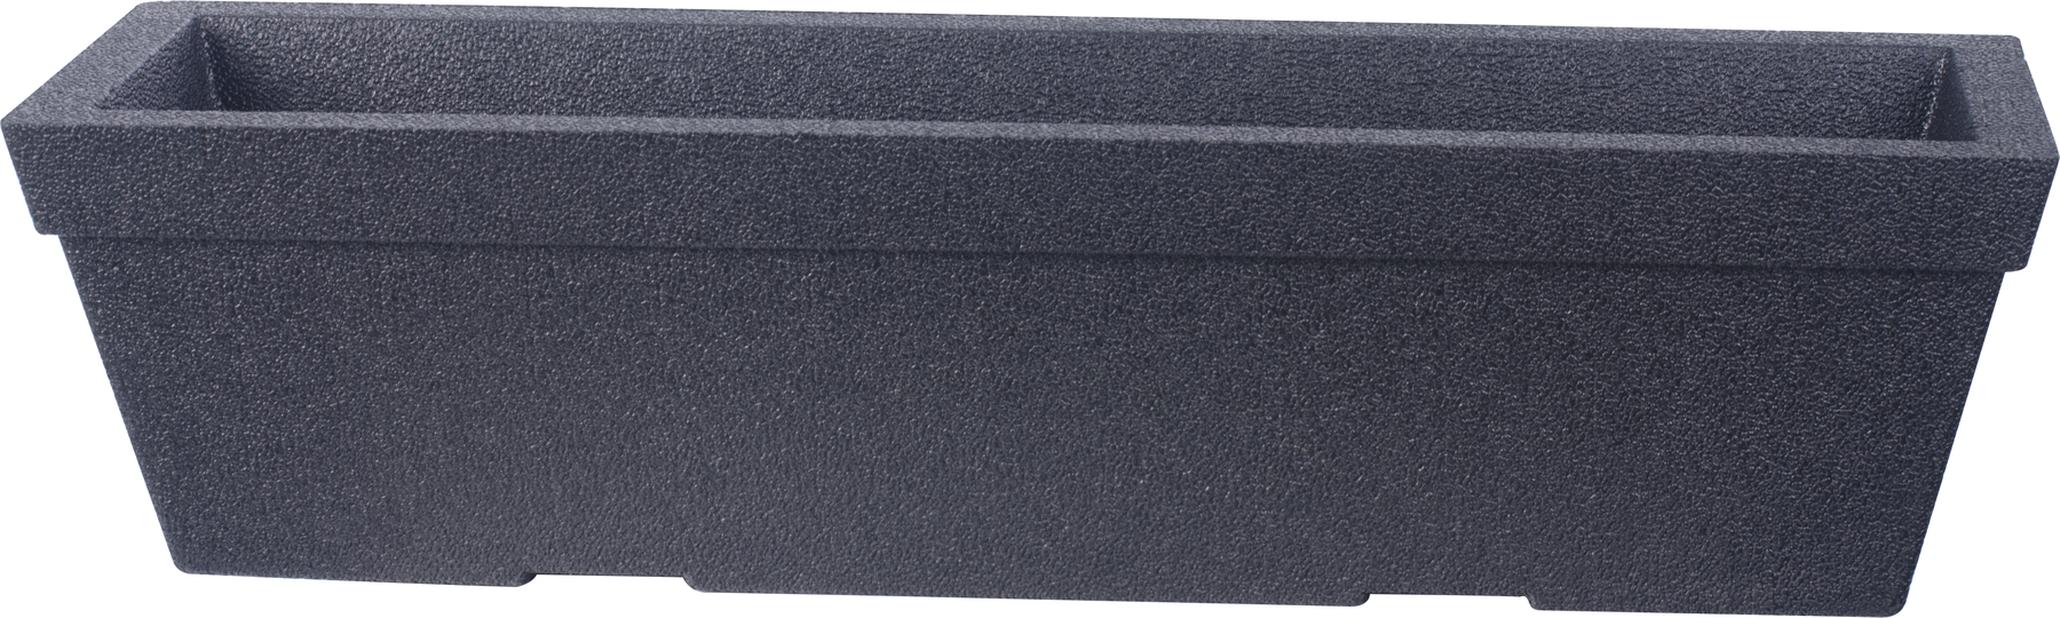 Parvekelaatikko Milla, Ø76 cm, Musta